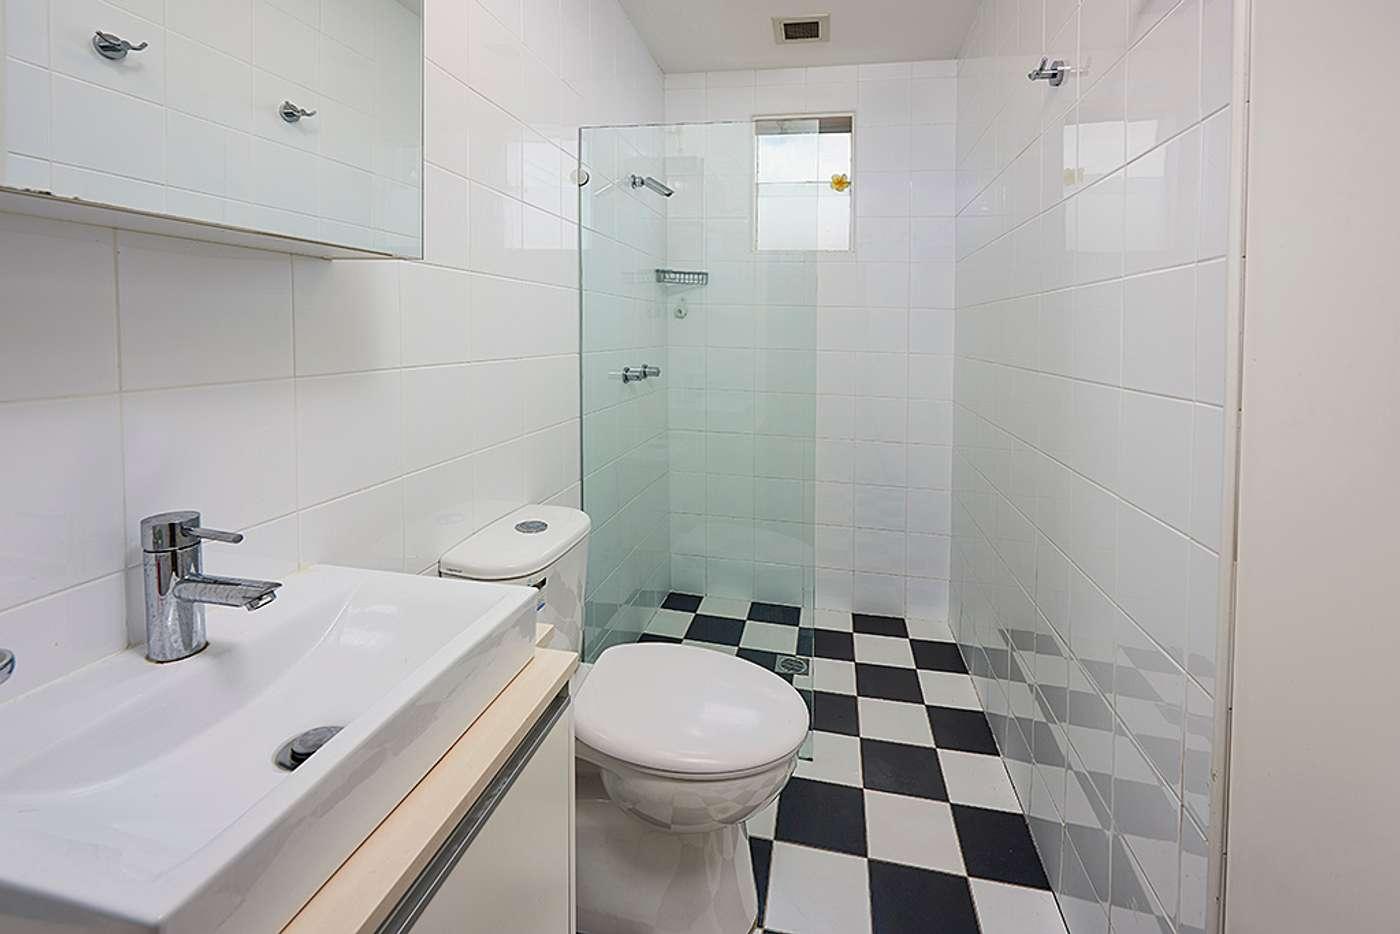 Sixth view of Homely blockOfUnits listing, 12 Albert Street, Petersham NSW 2049